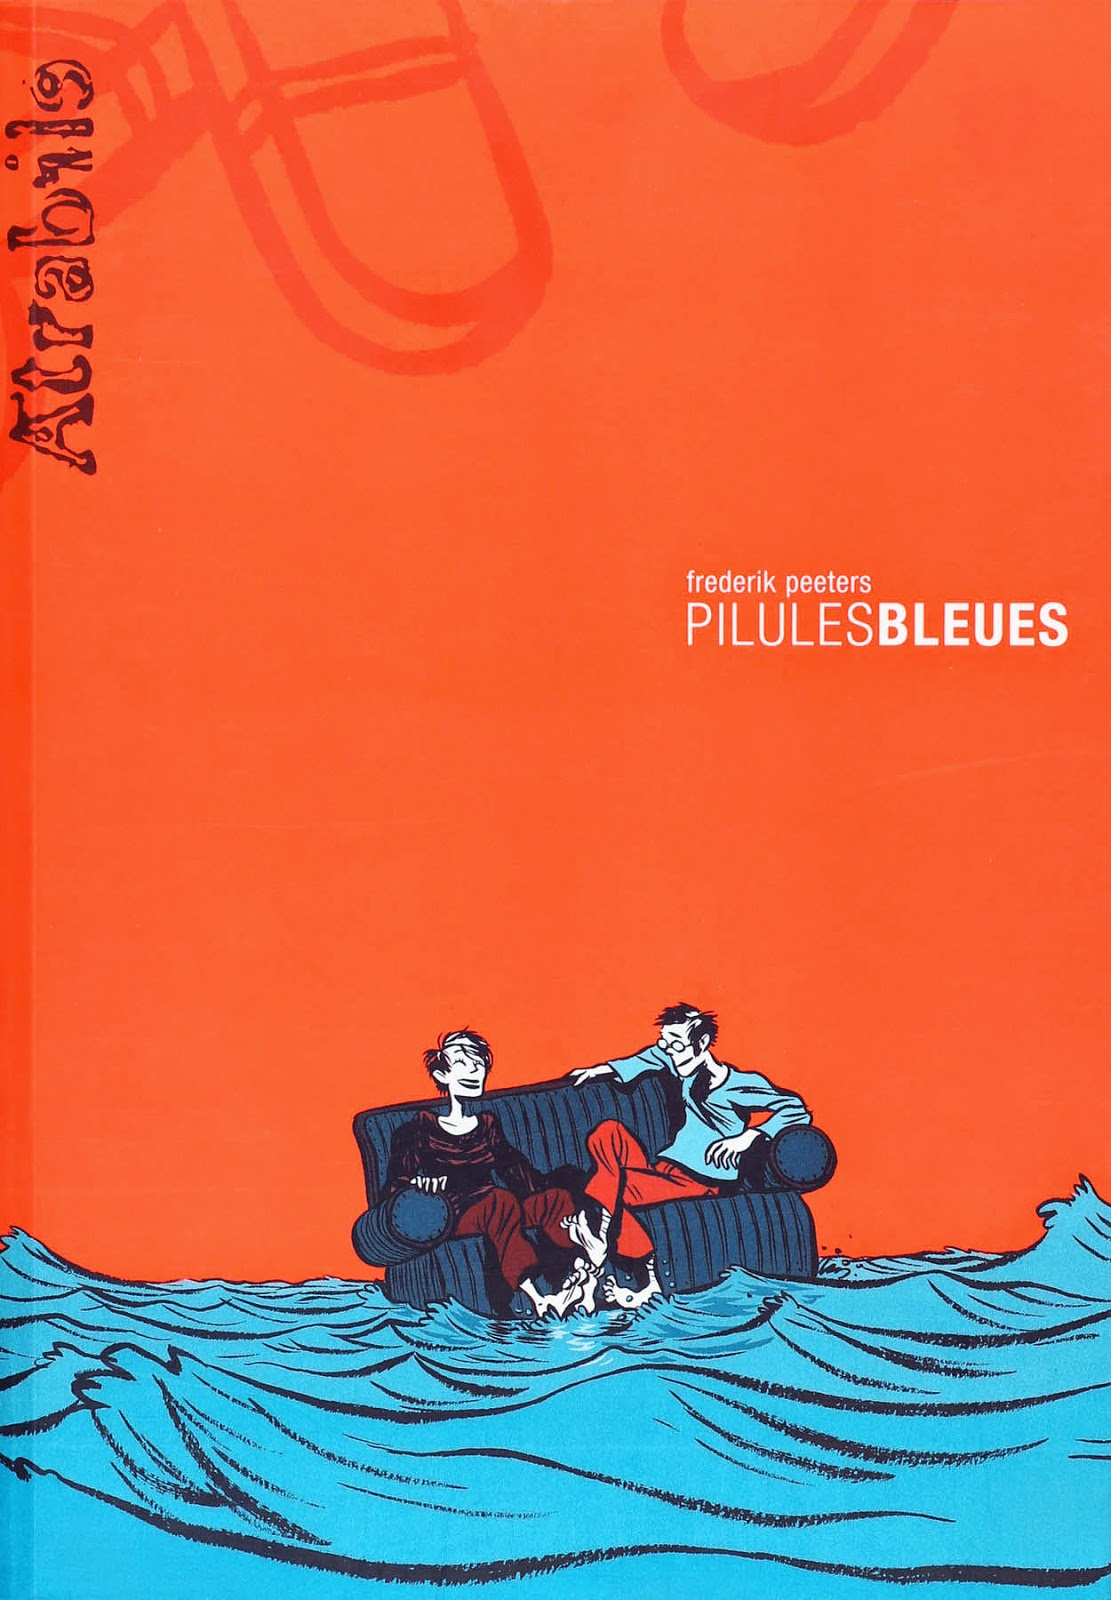 Pilules Bleues - Frederik Peeters - Editions Atrabile